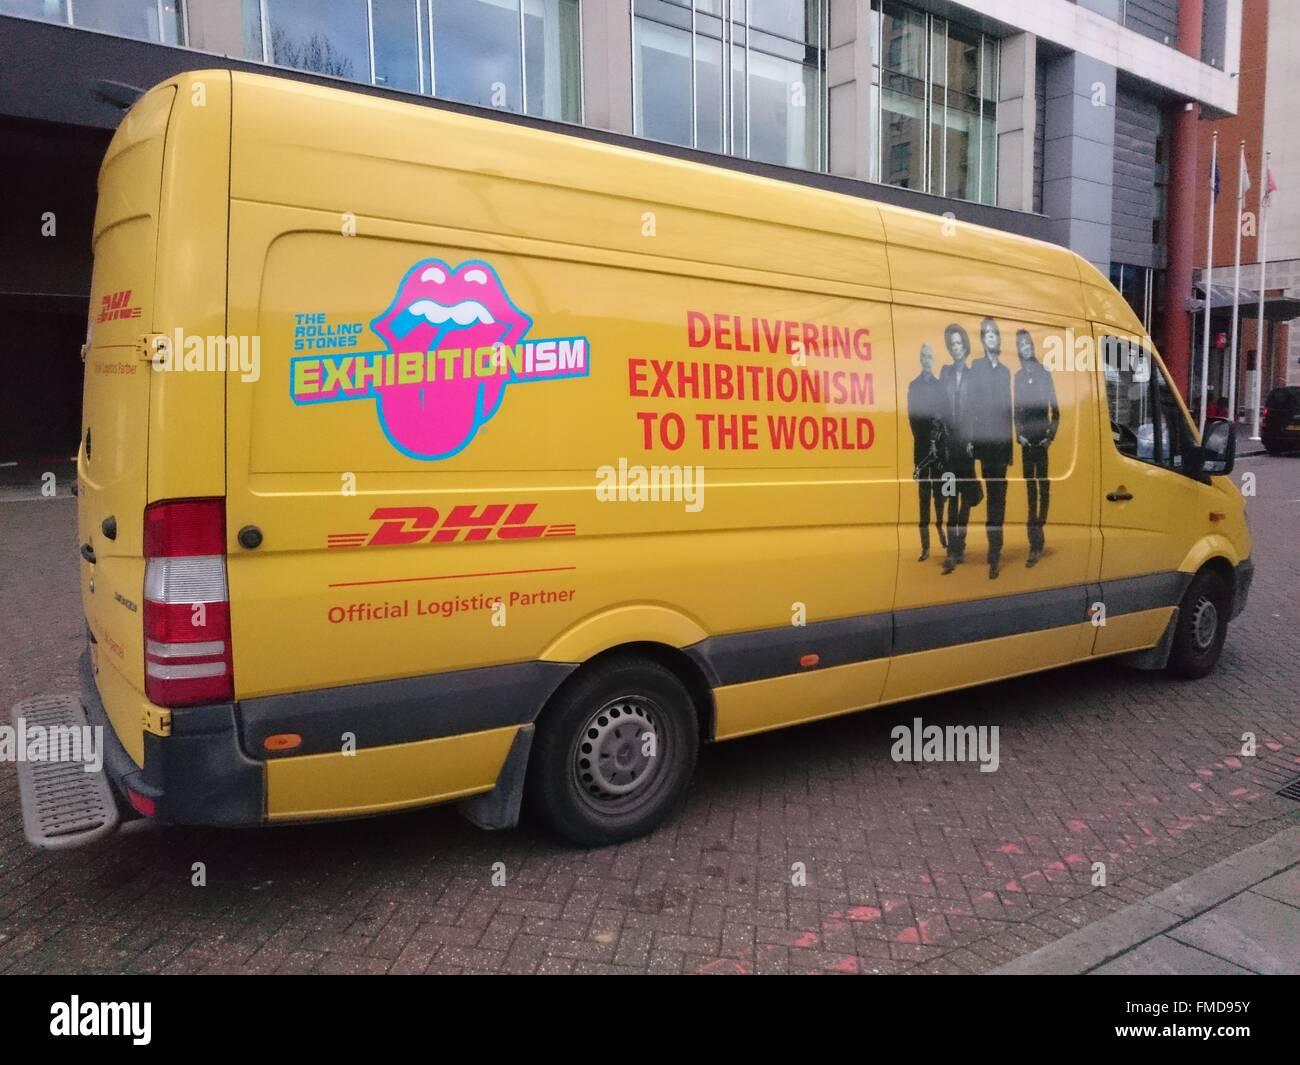 Car exhibitionism